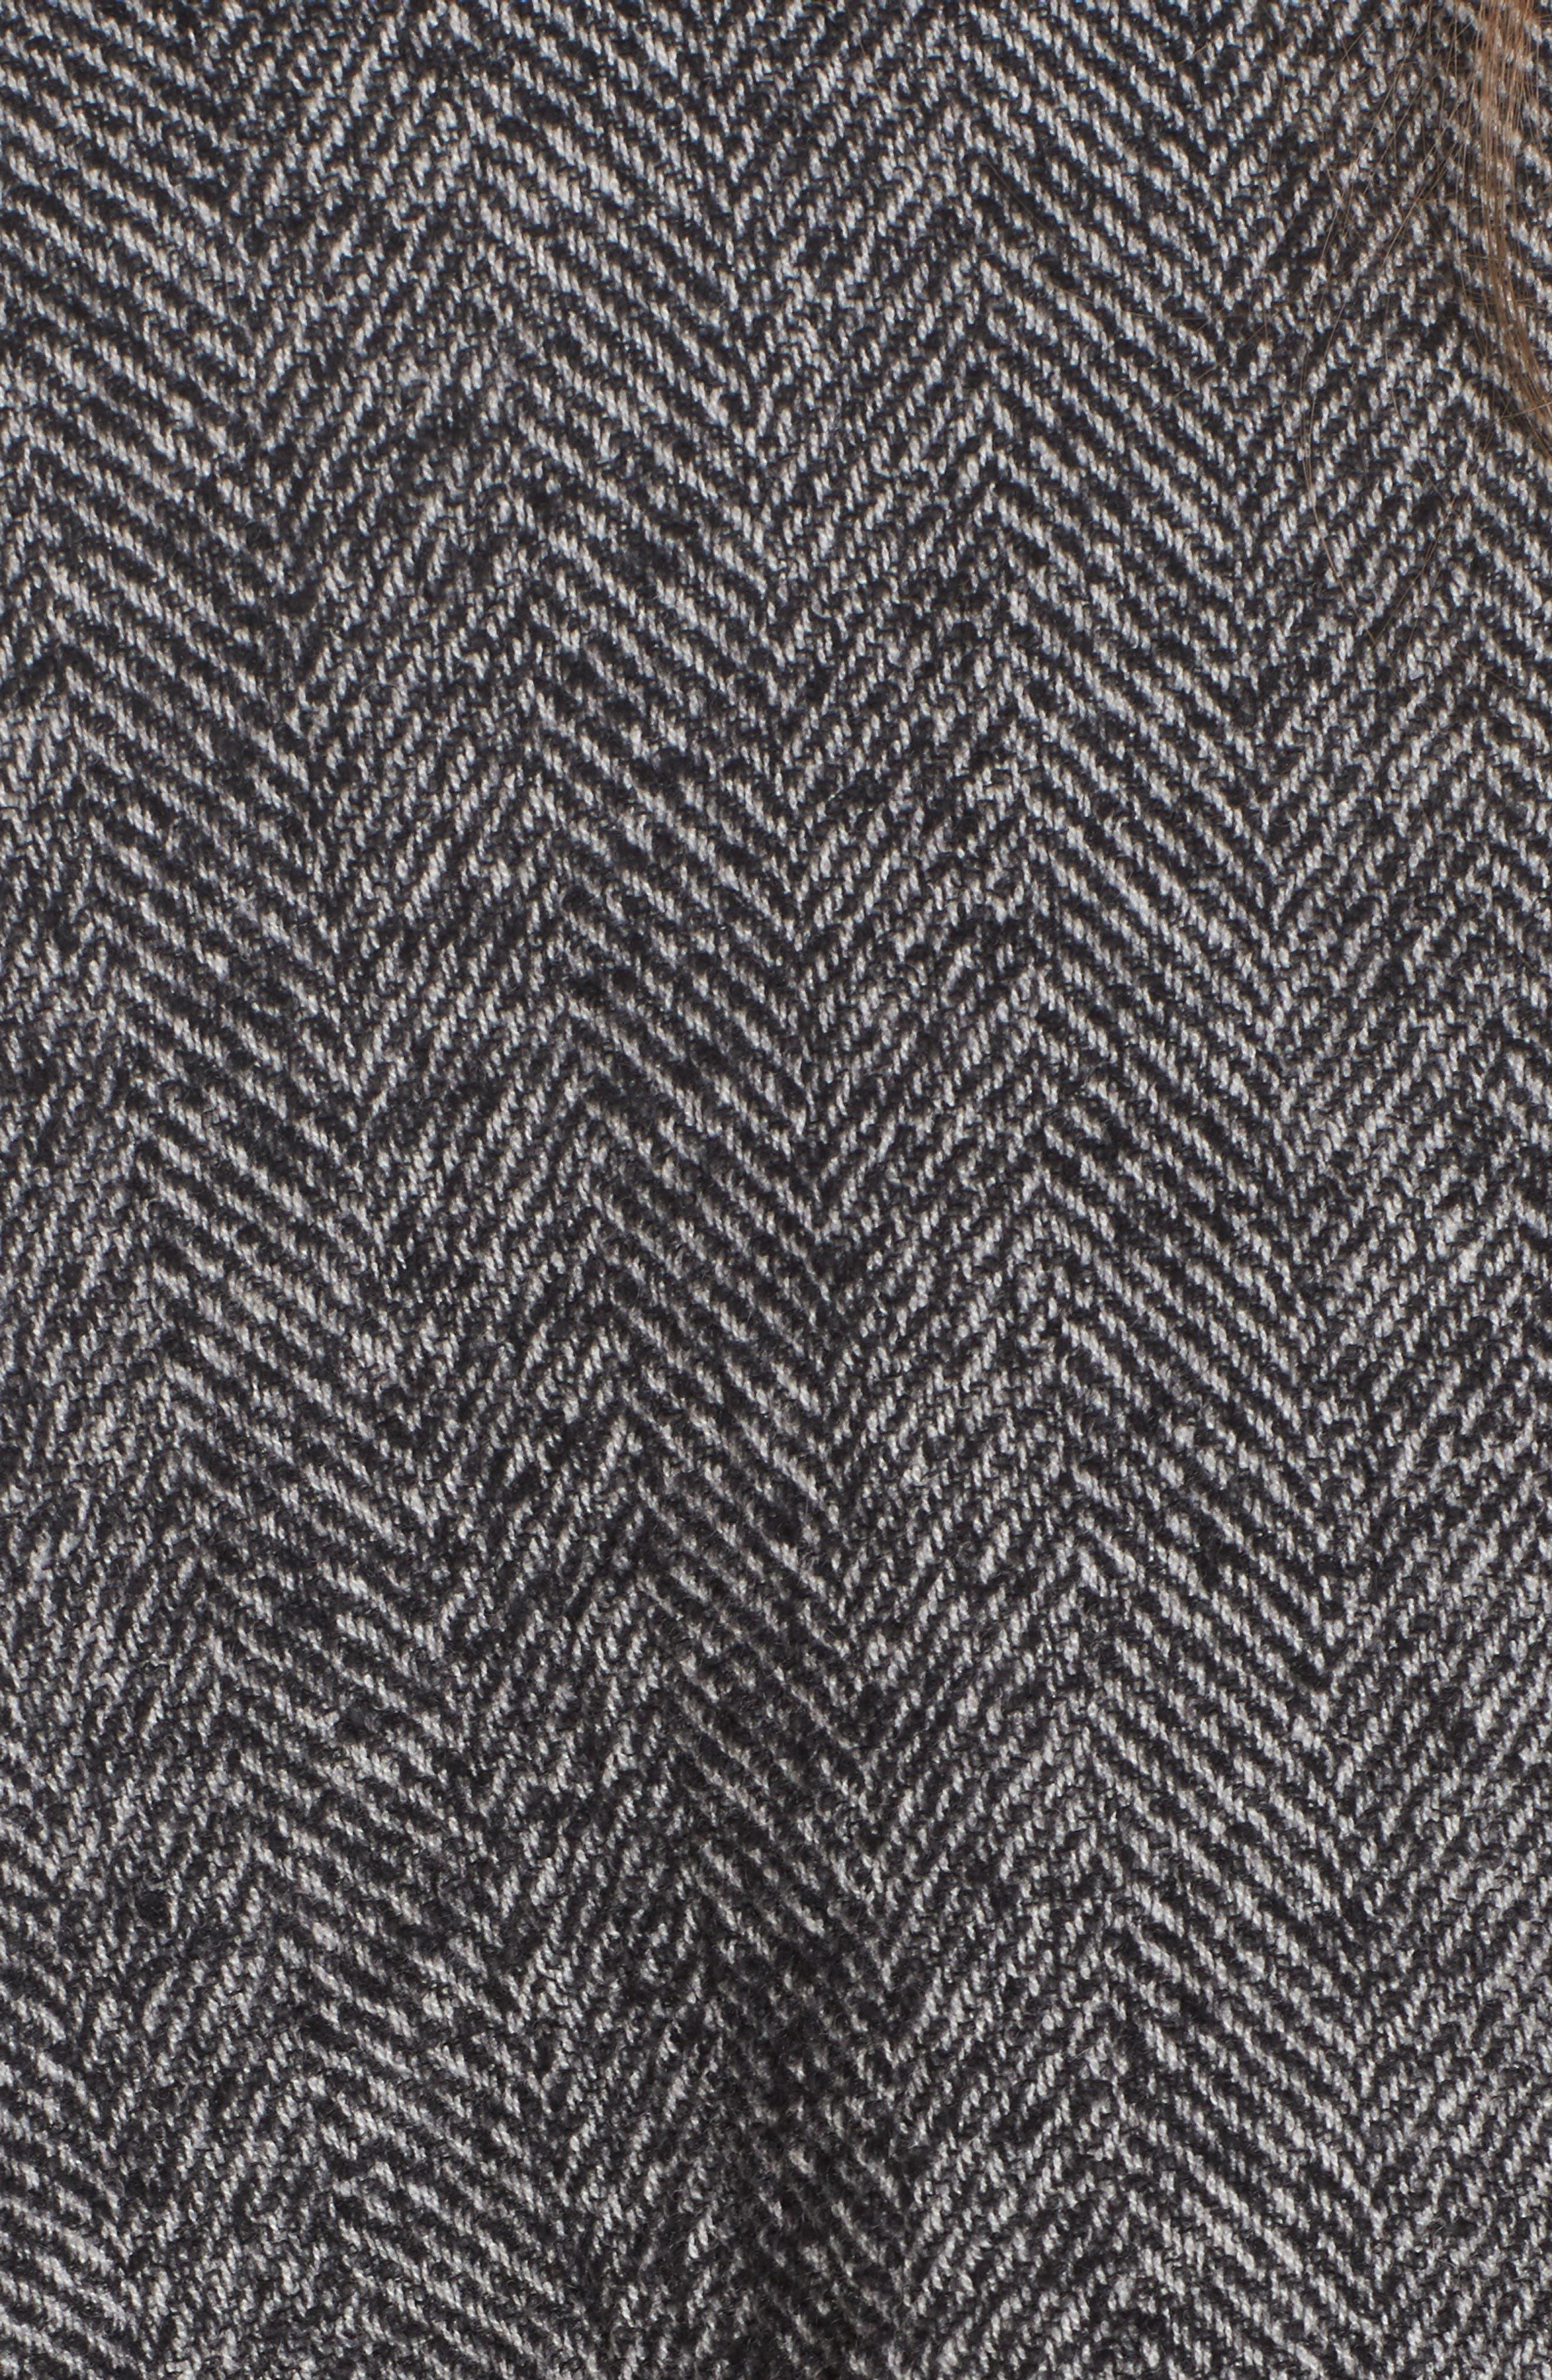 Herringbone Cashmere & Wool Cape,                             Alternate thumbnail 5, color,                             020